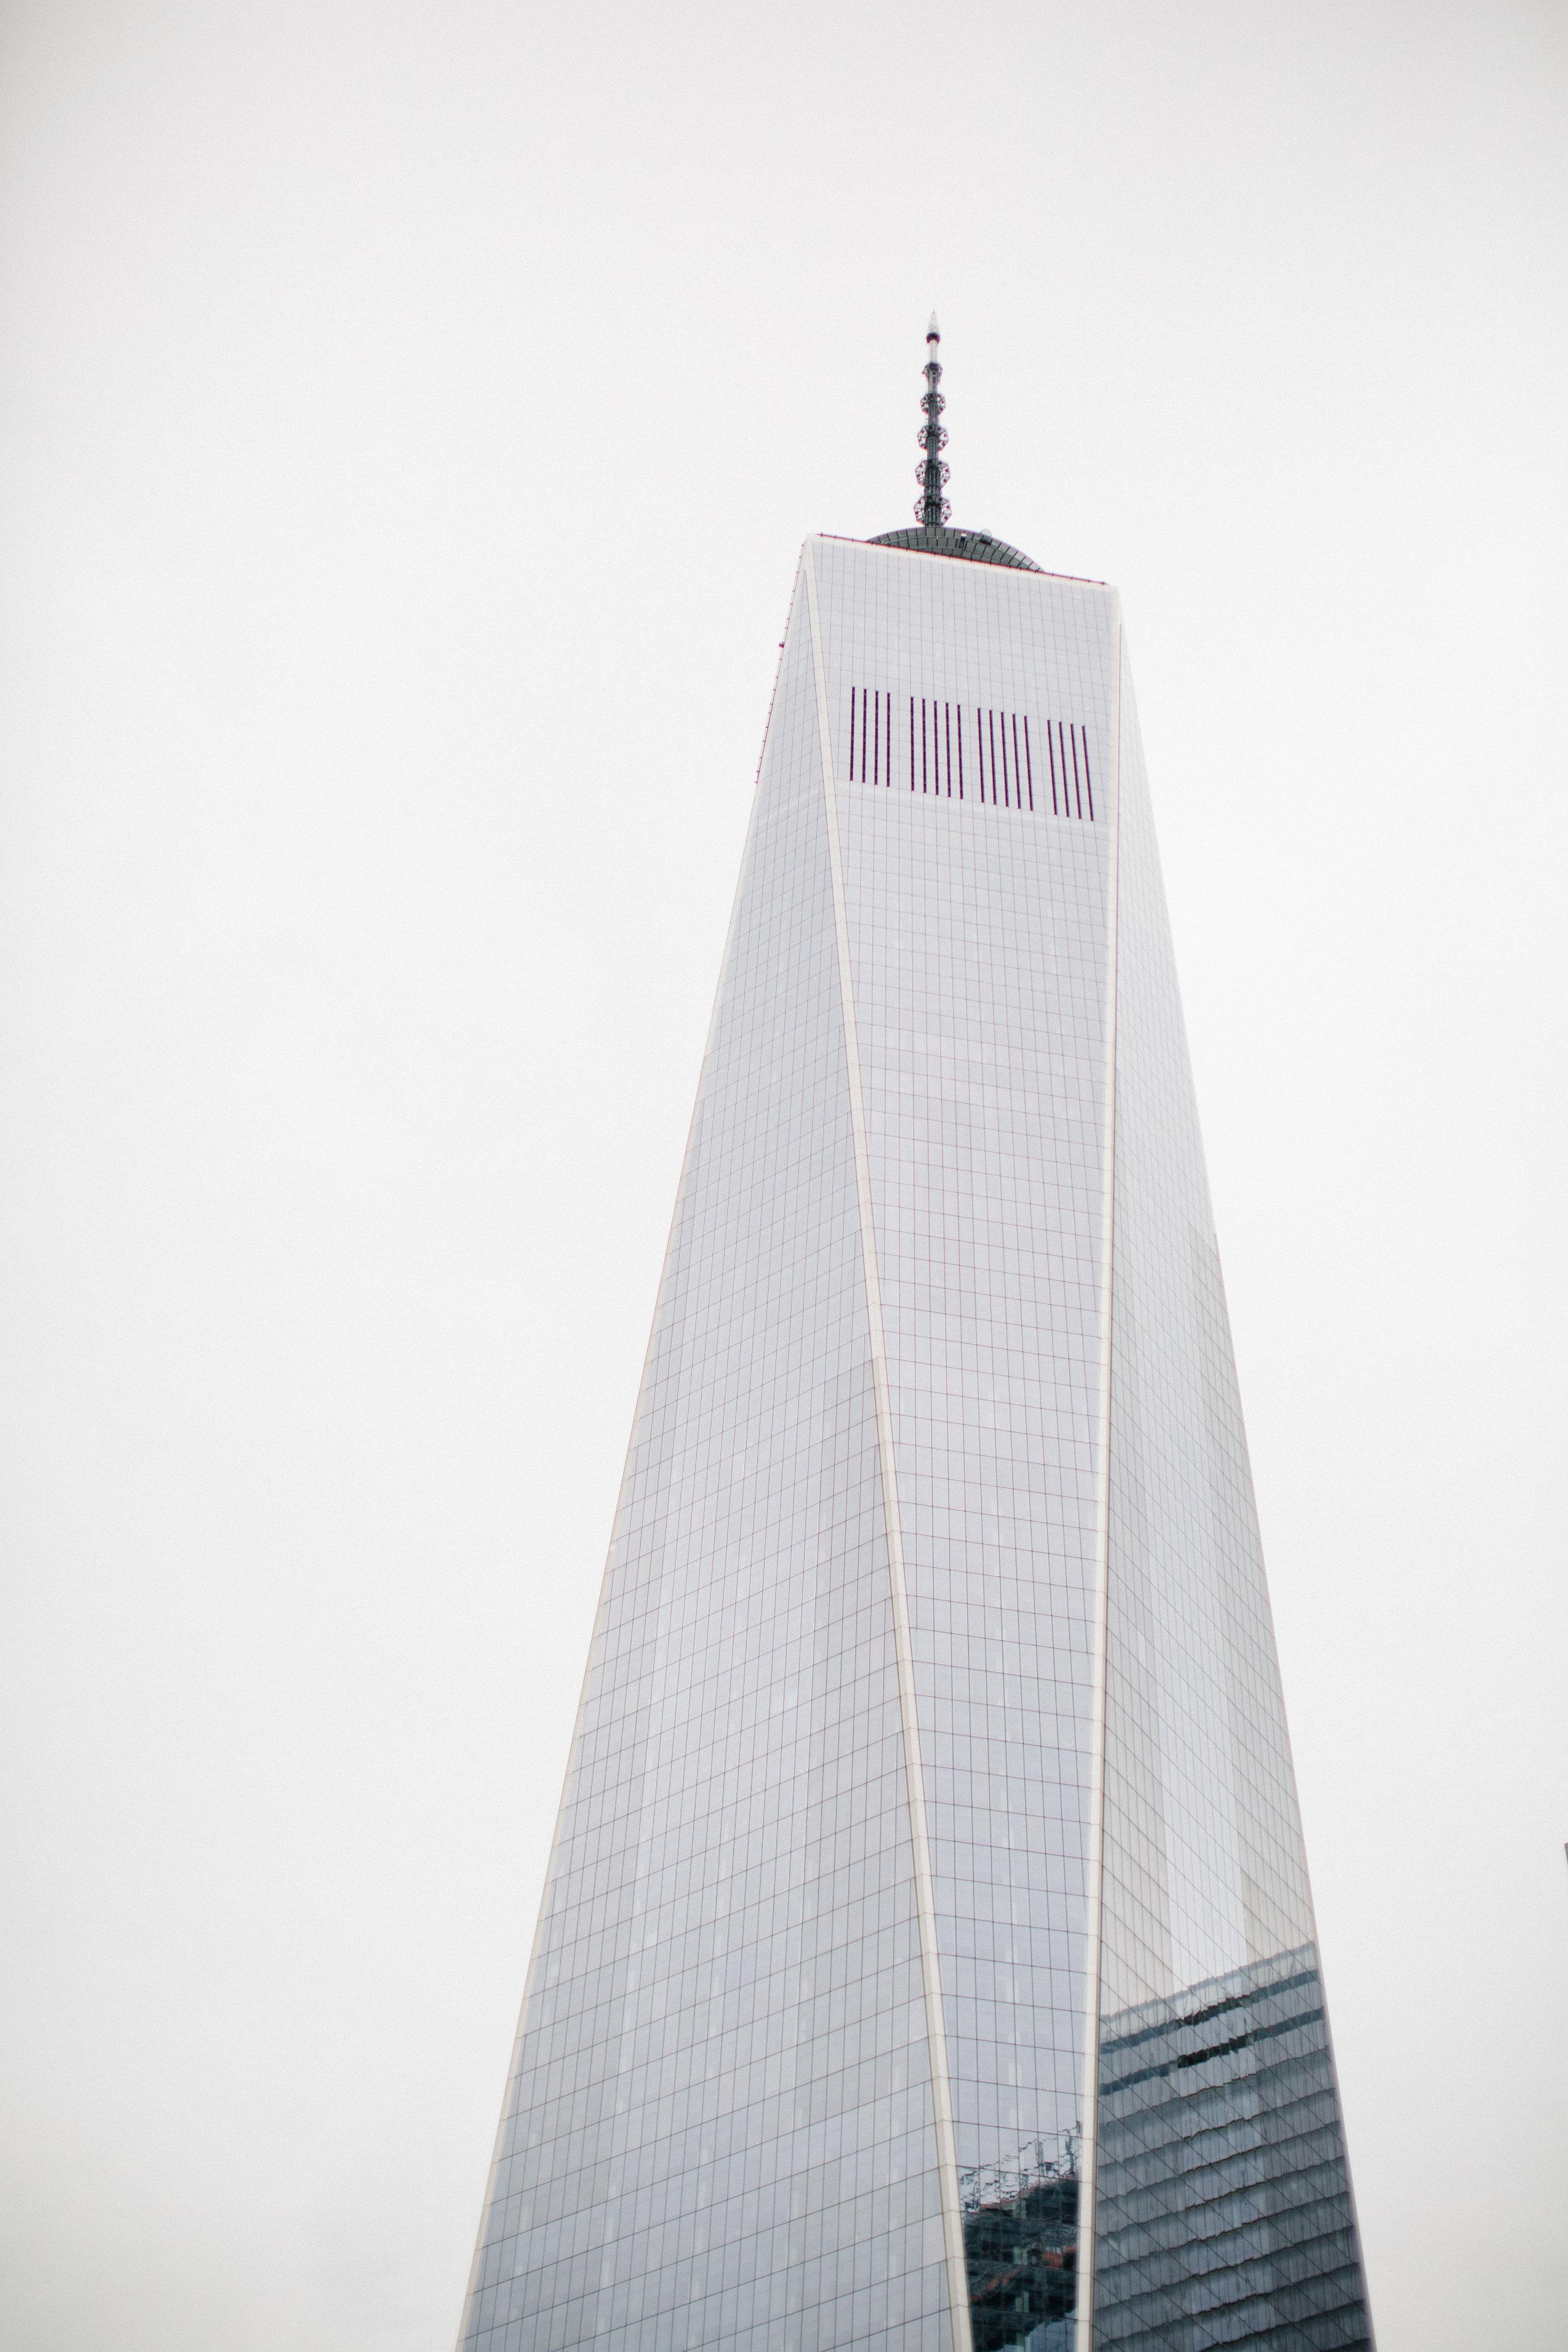 new york-50.jpg